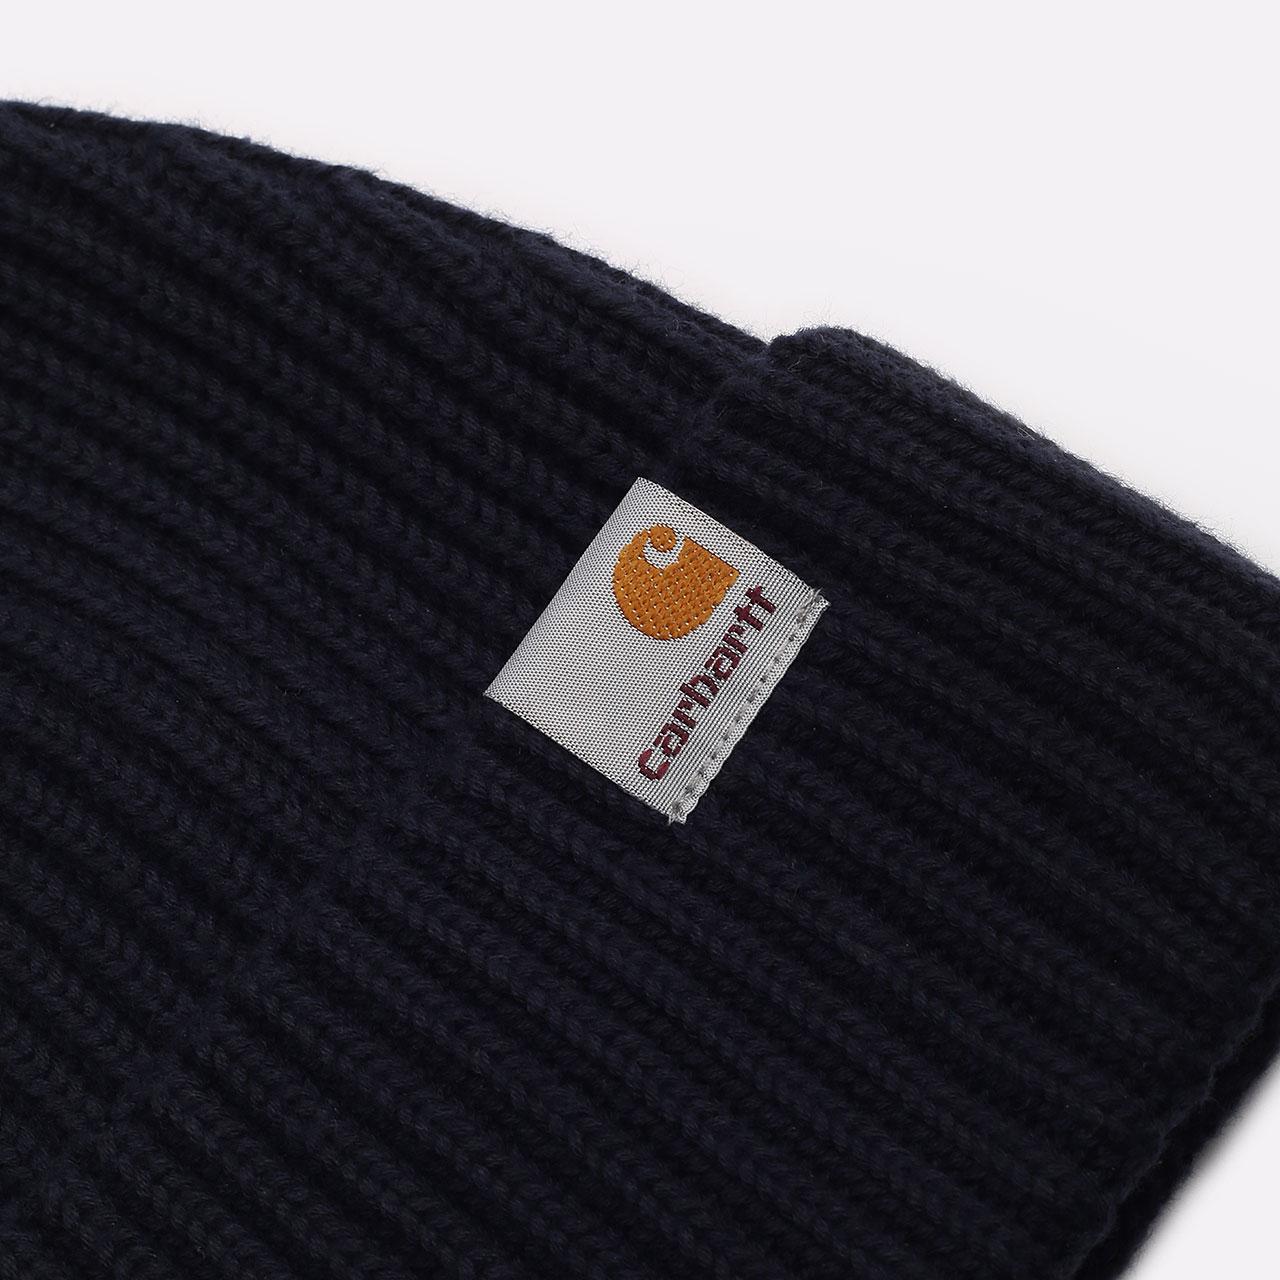 синяя шапка Carhartt WIP Burbank Beanie I029491-dark navy - цена, описание, фото 2